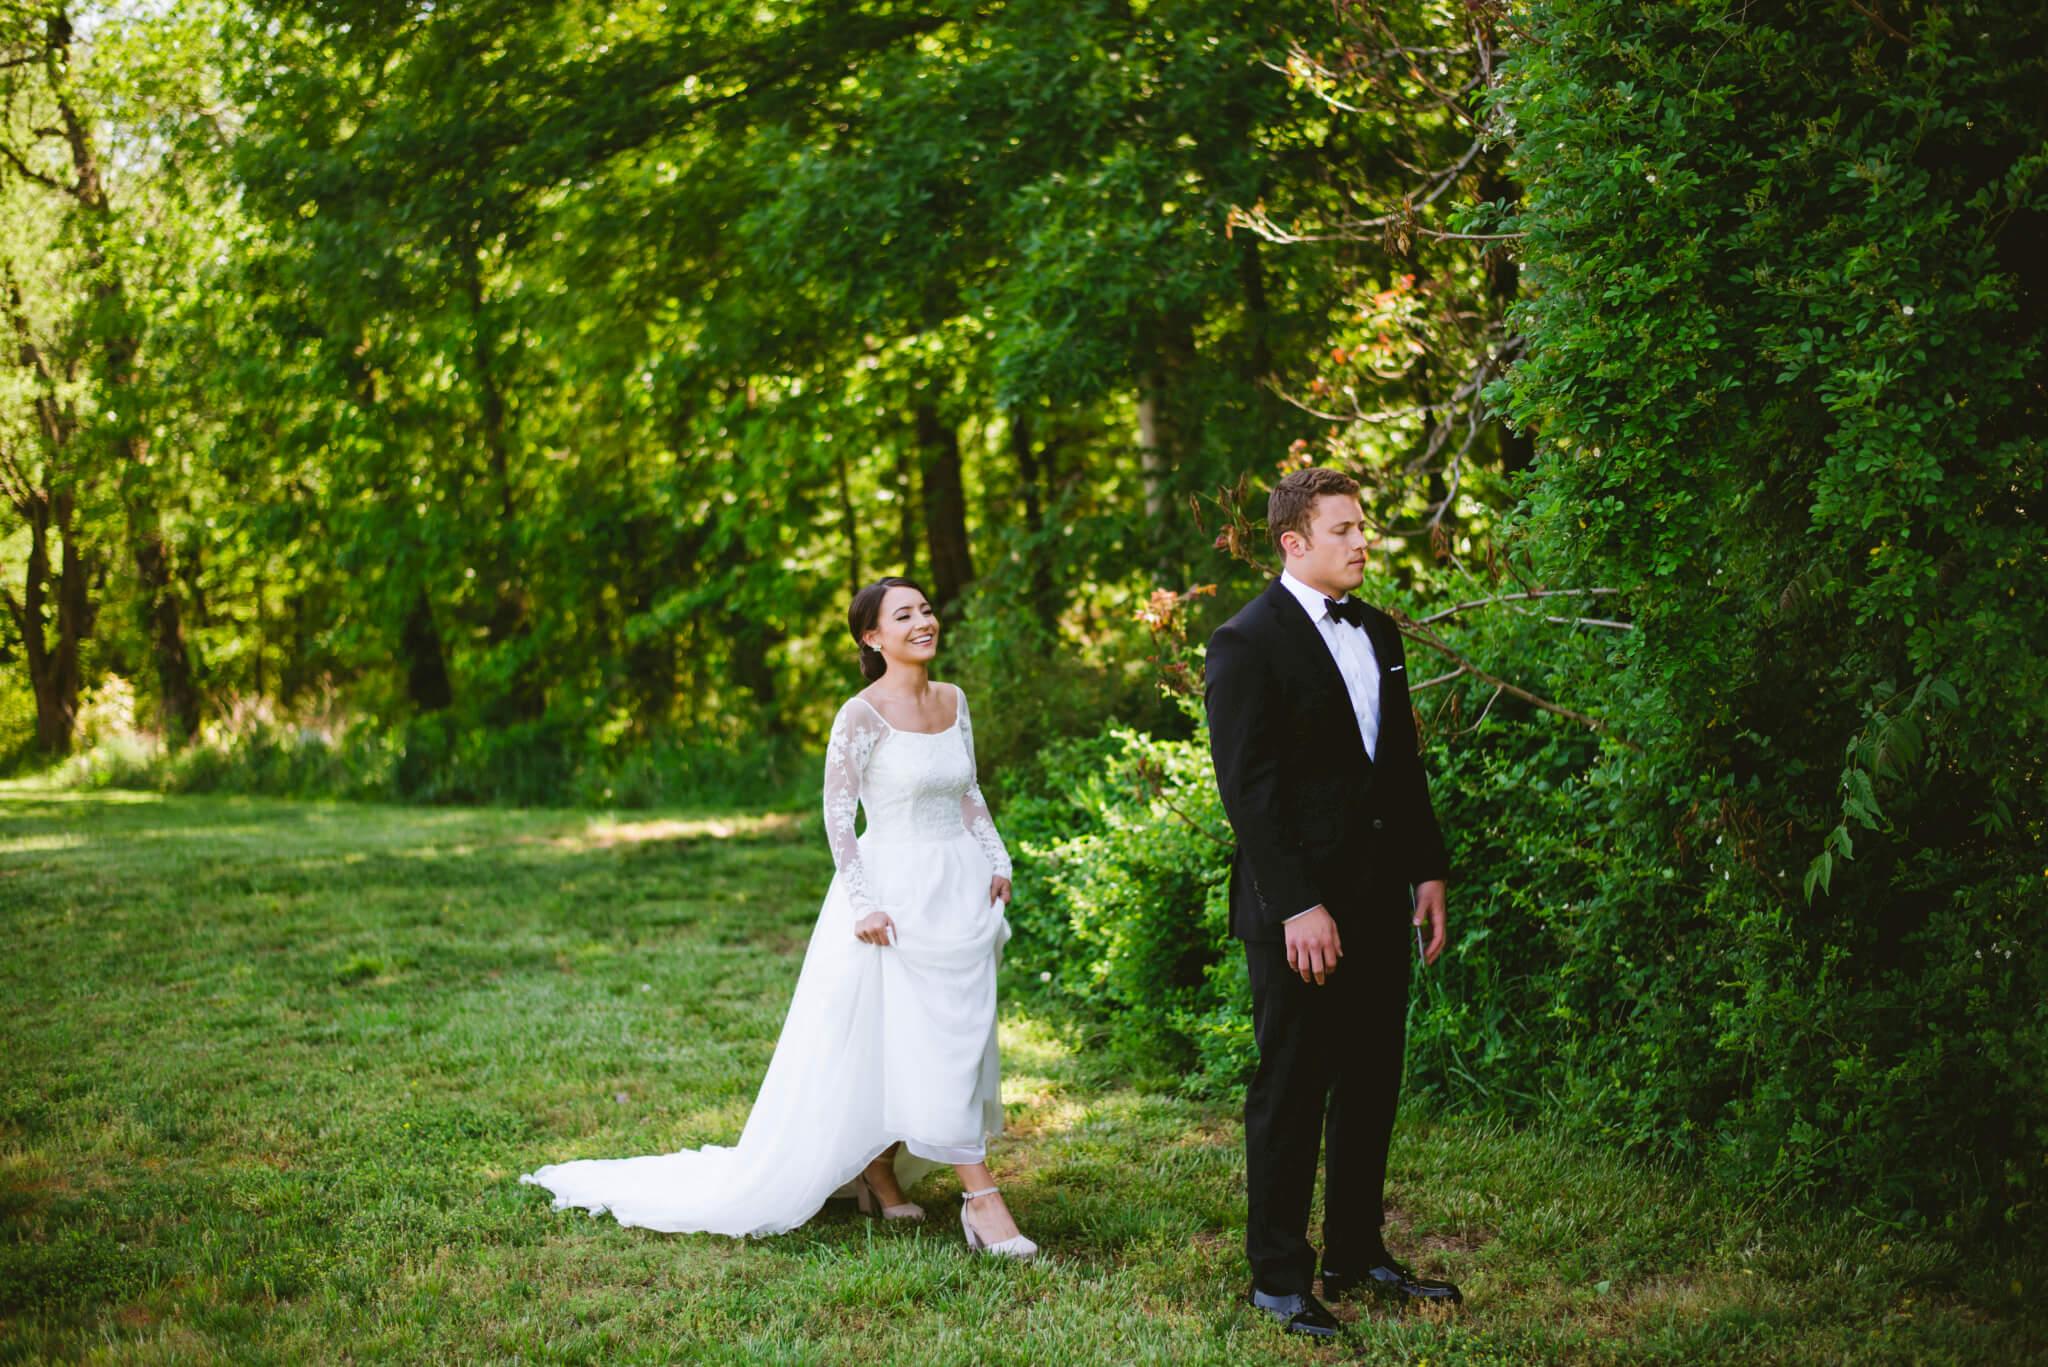 Glackin-Wedding-226-2.jpg